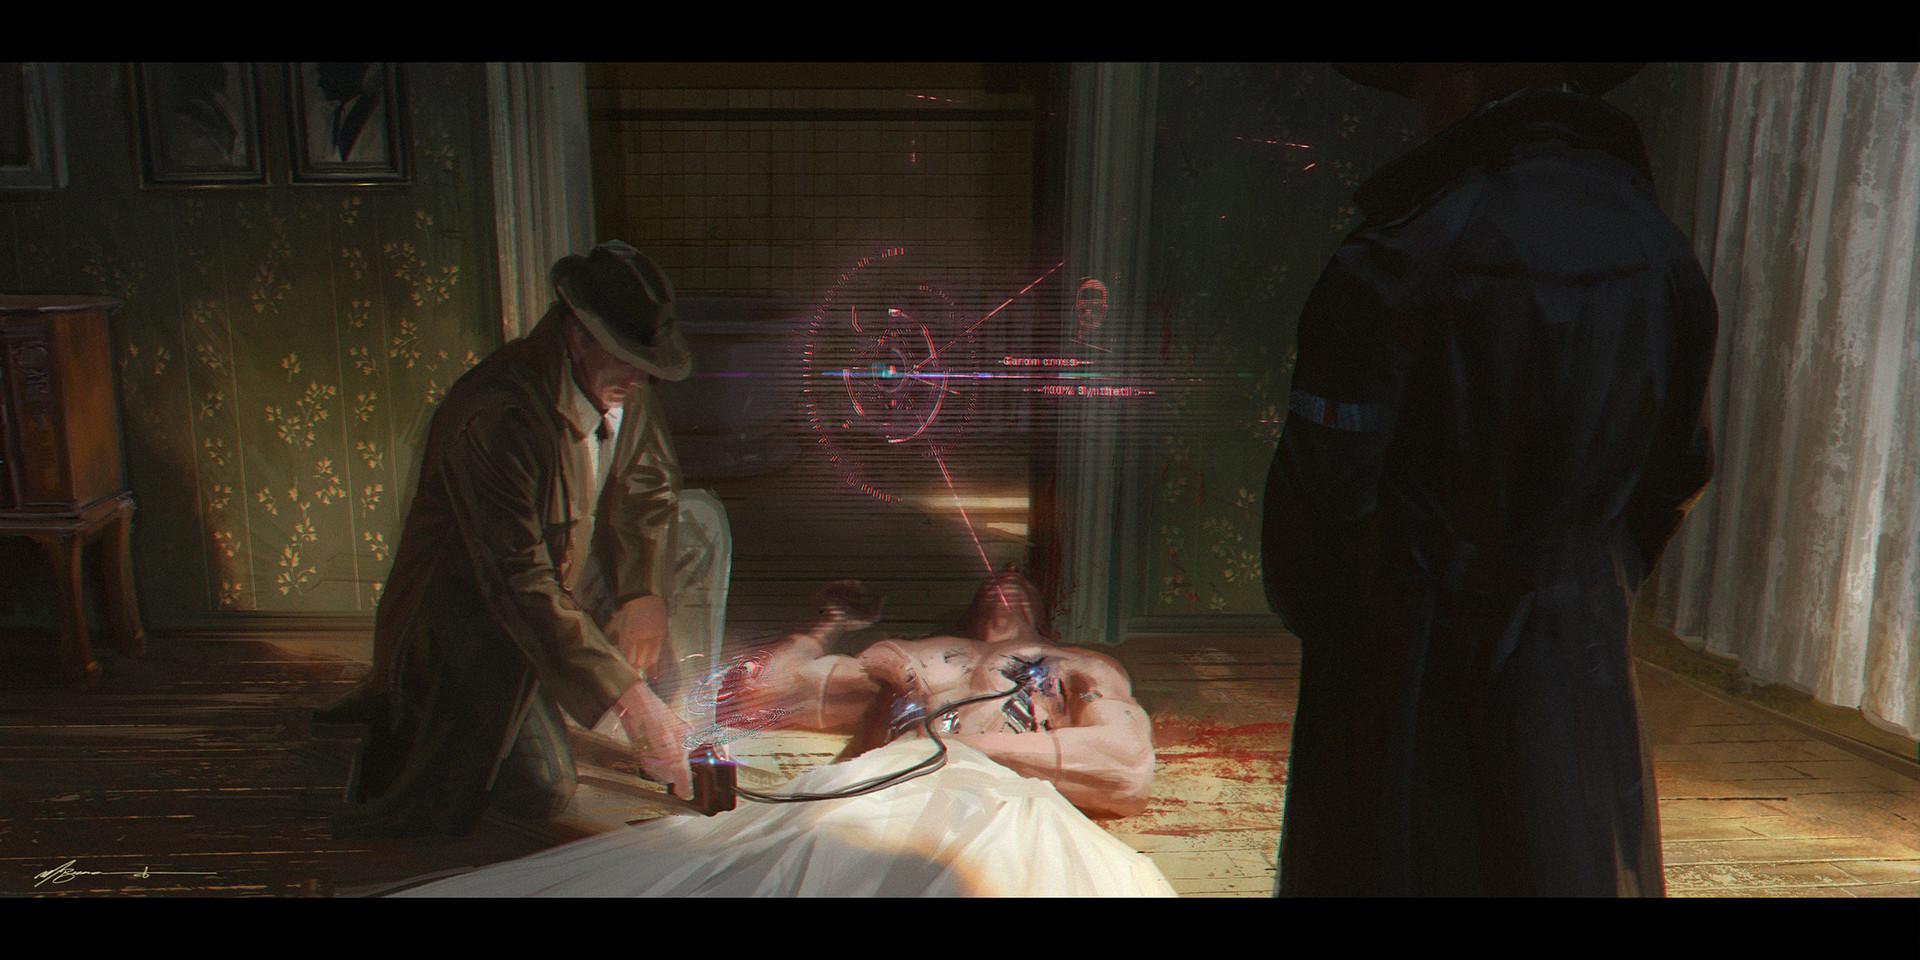 michael-broussard-crime-scene.jpg?149784